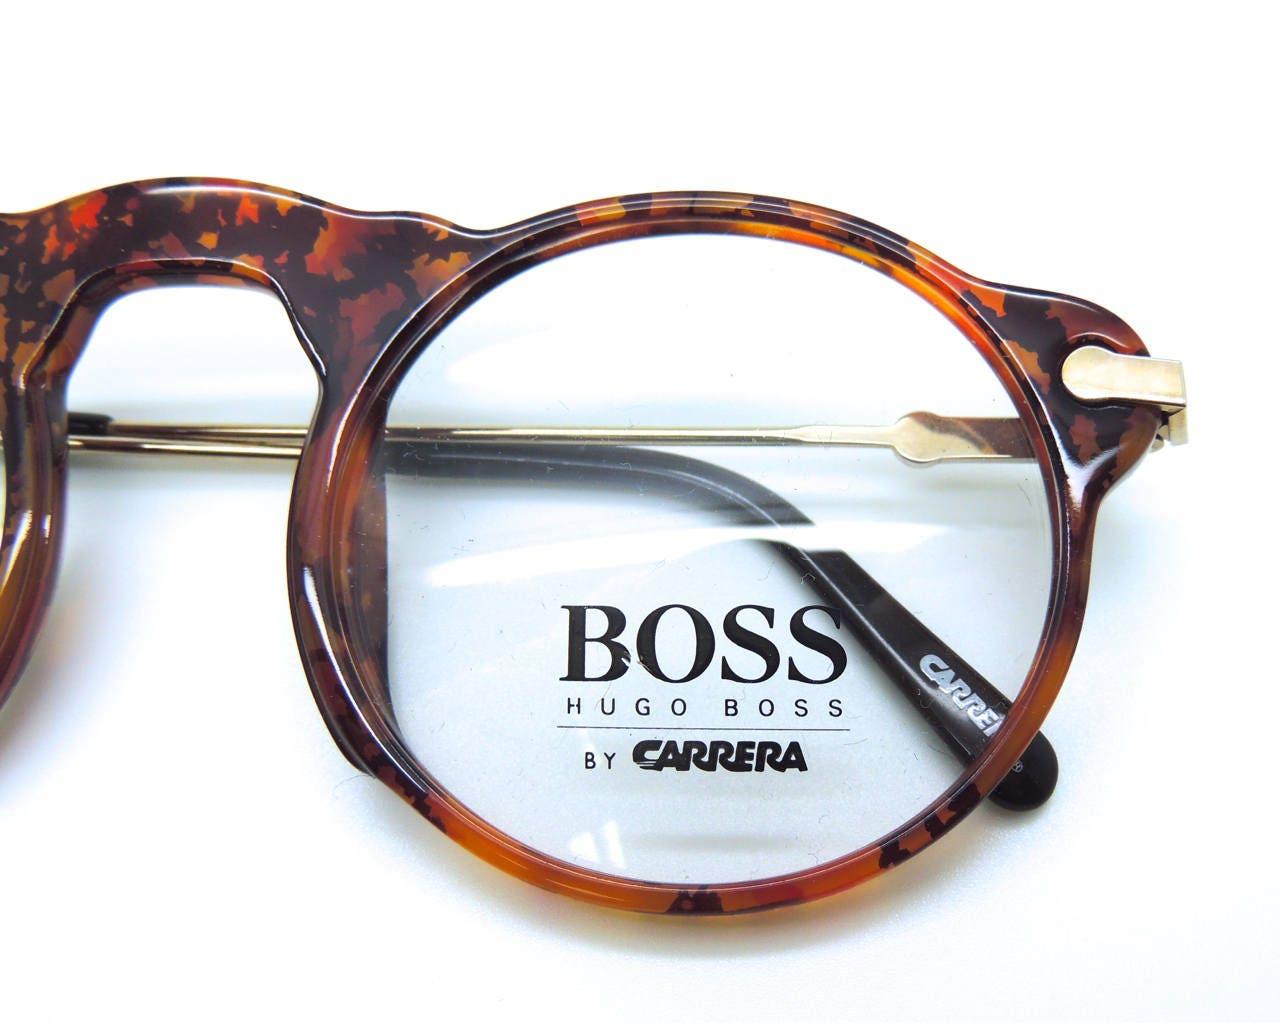 fe286ee30e Hugo BOSS by Carrera 5108 True Round Vintage Glasses Frames In Tortoiseshell  Acrylic - Brand New